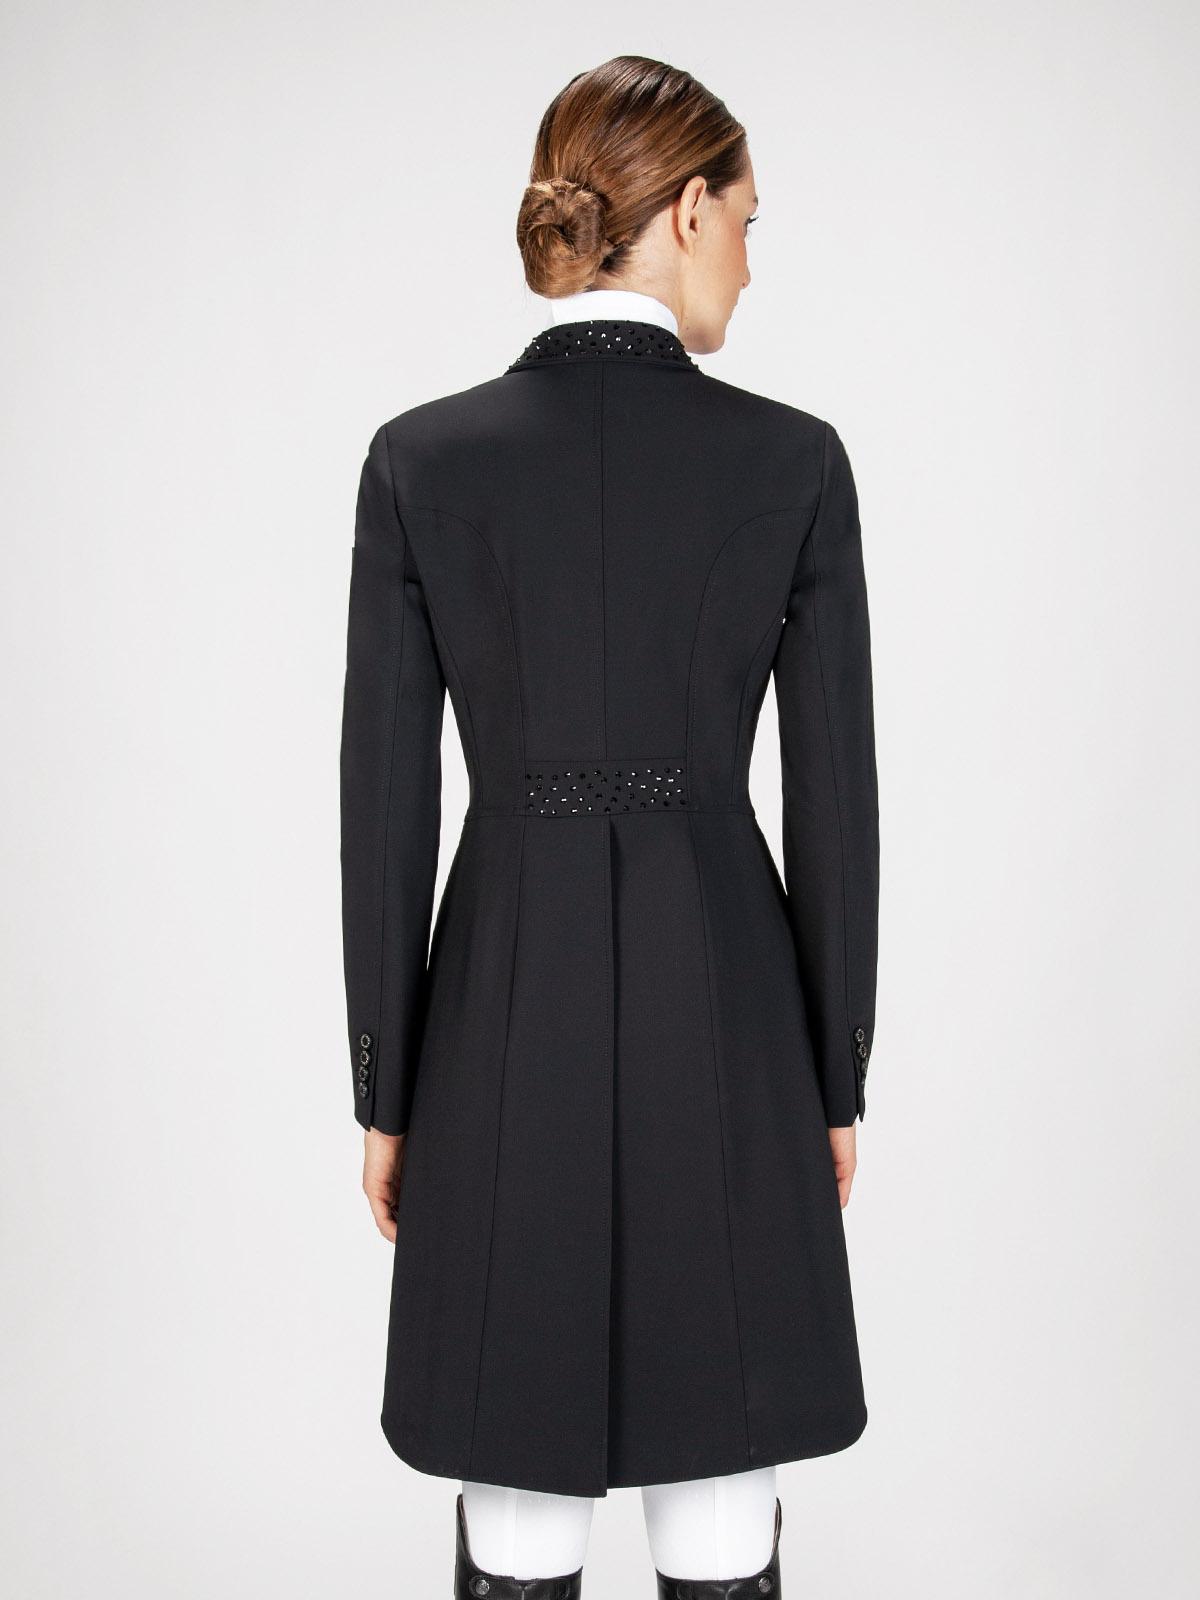 MARILYN - Women's Dressage Tail Coat X-Cool Evo 2